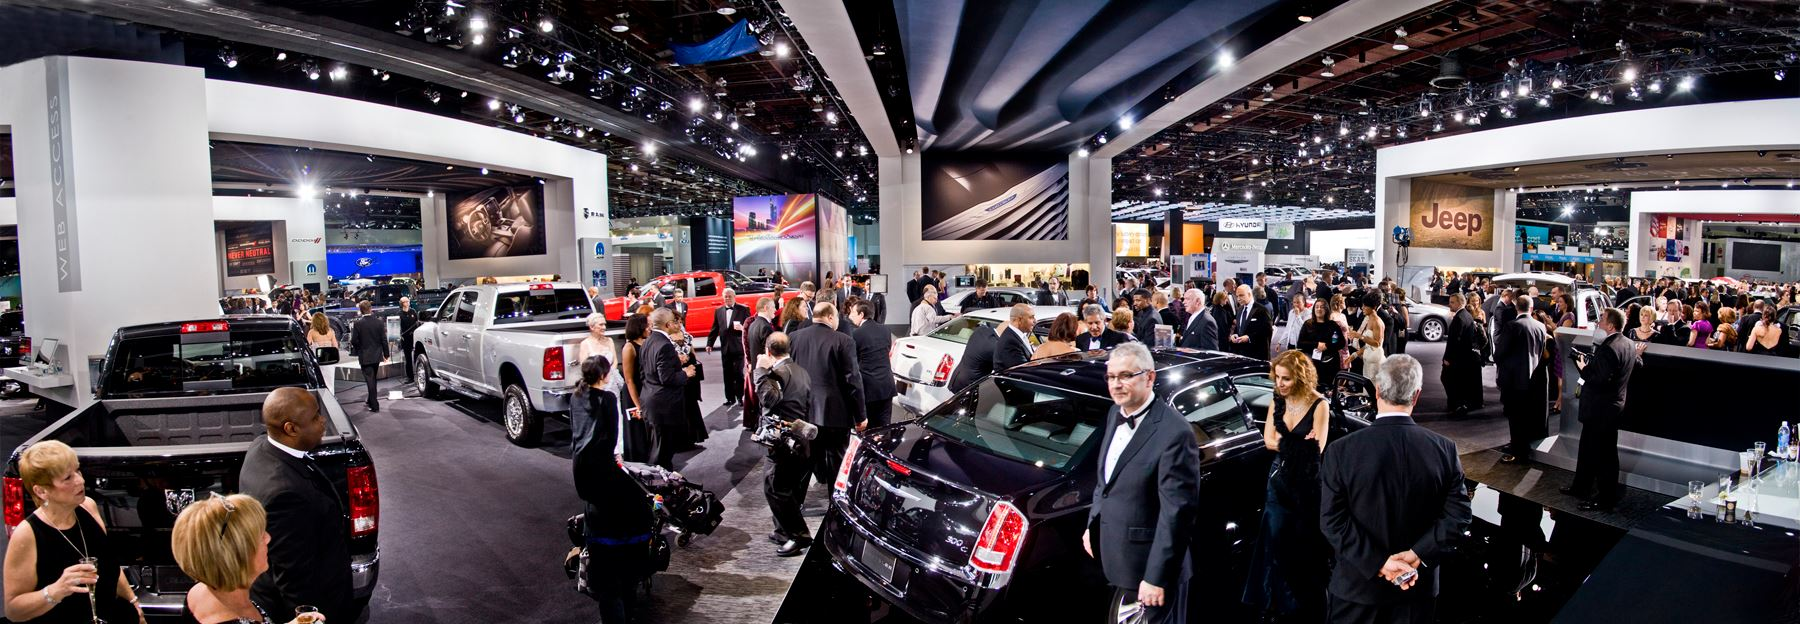 Auto Show Panorama